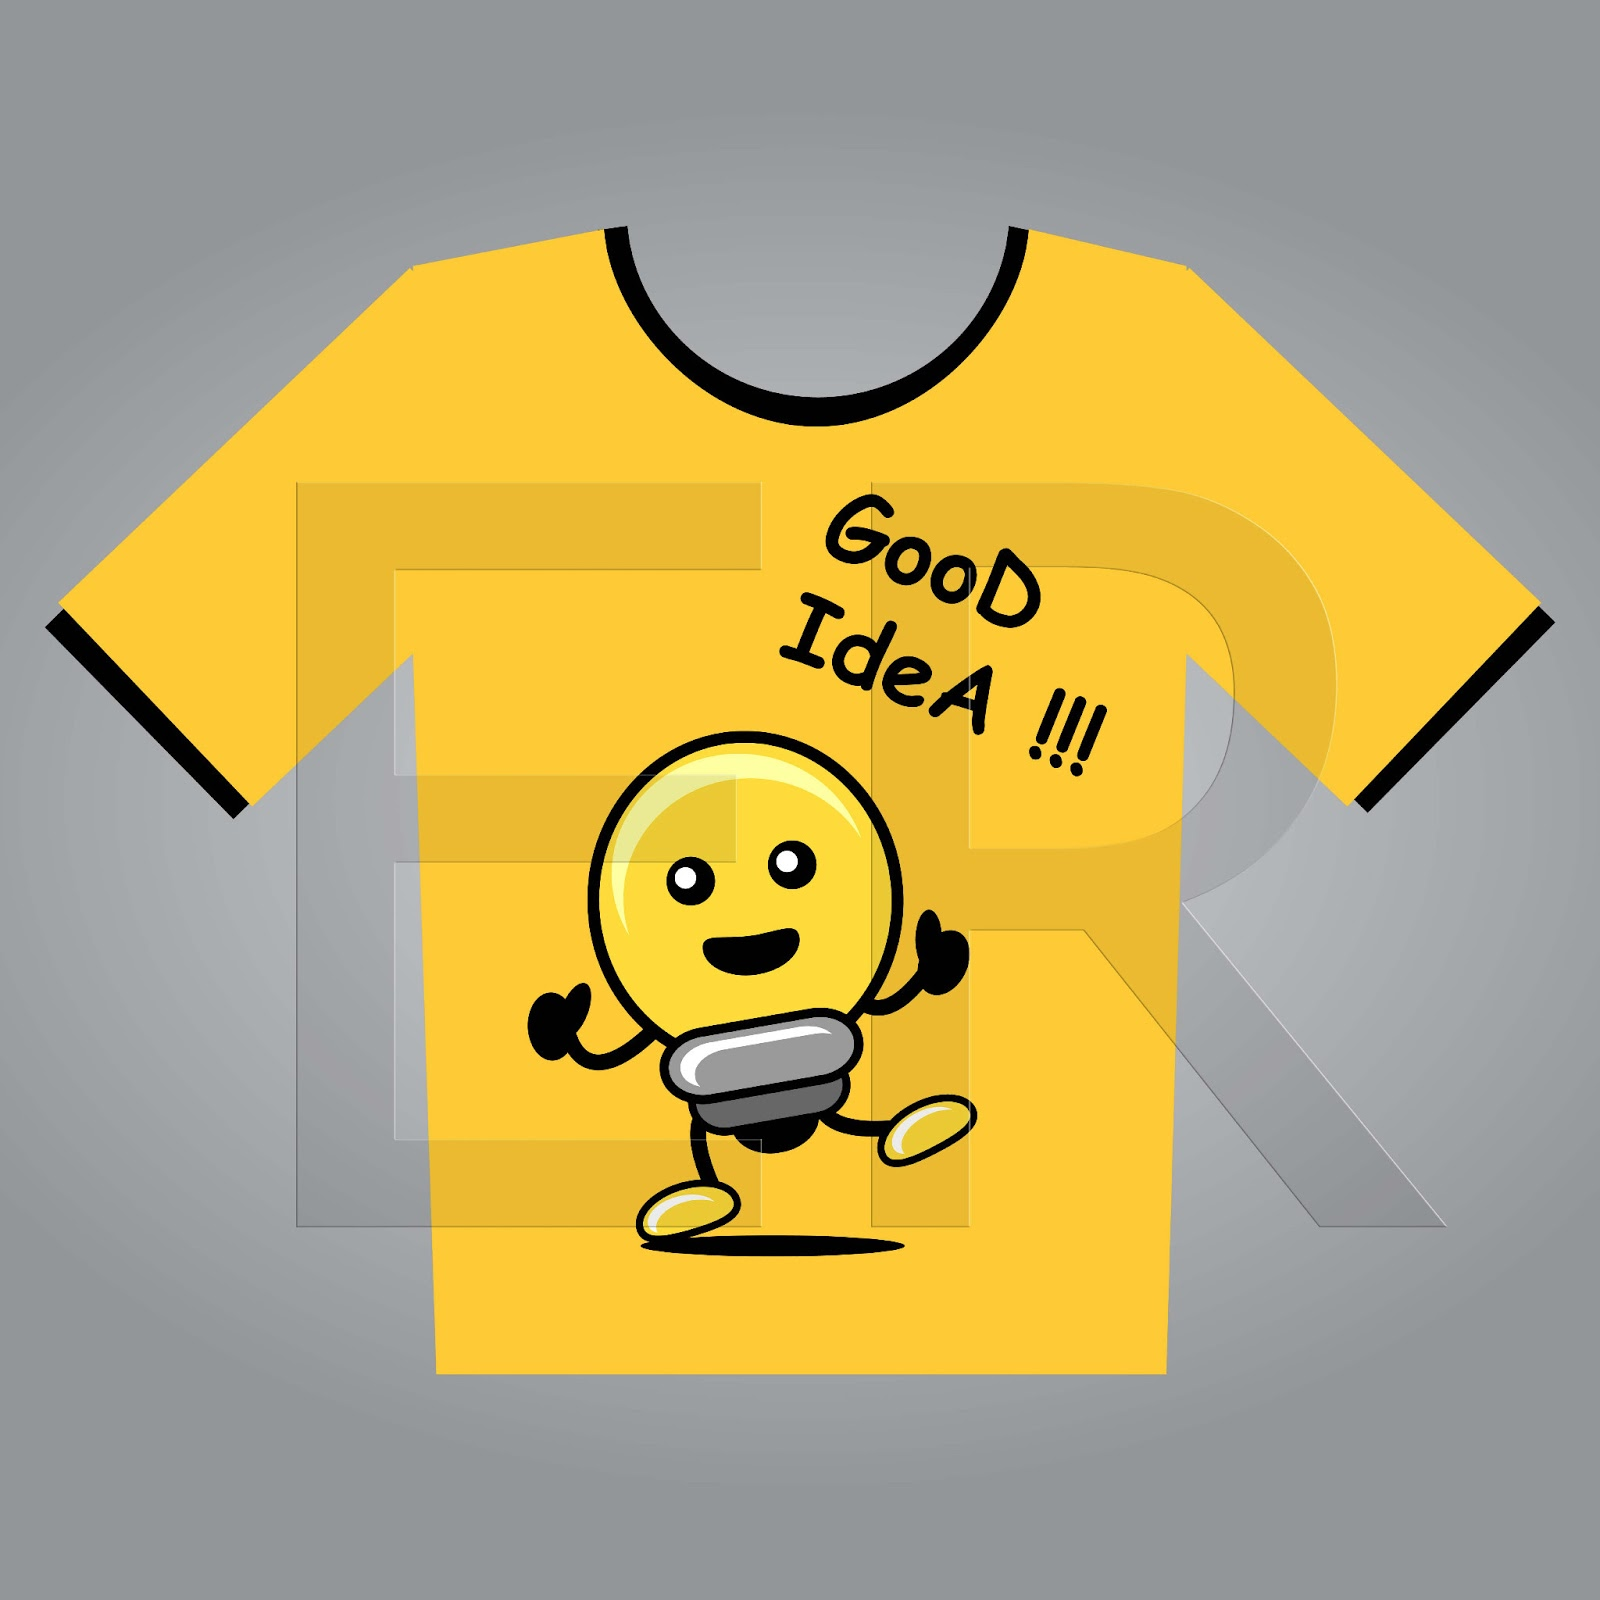 Cartoon Character T Shirt Design : Cartoon character t shirt design ankaperla